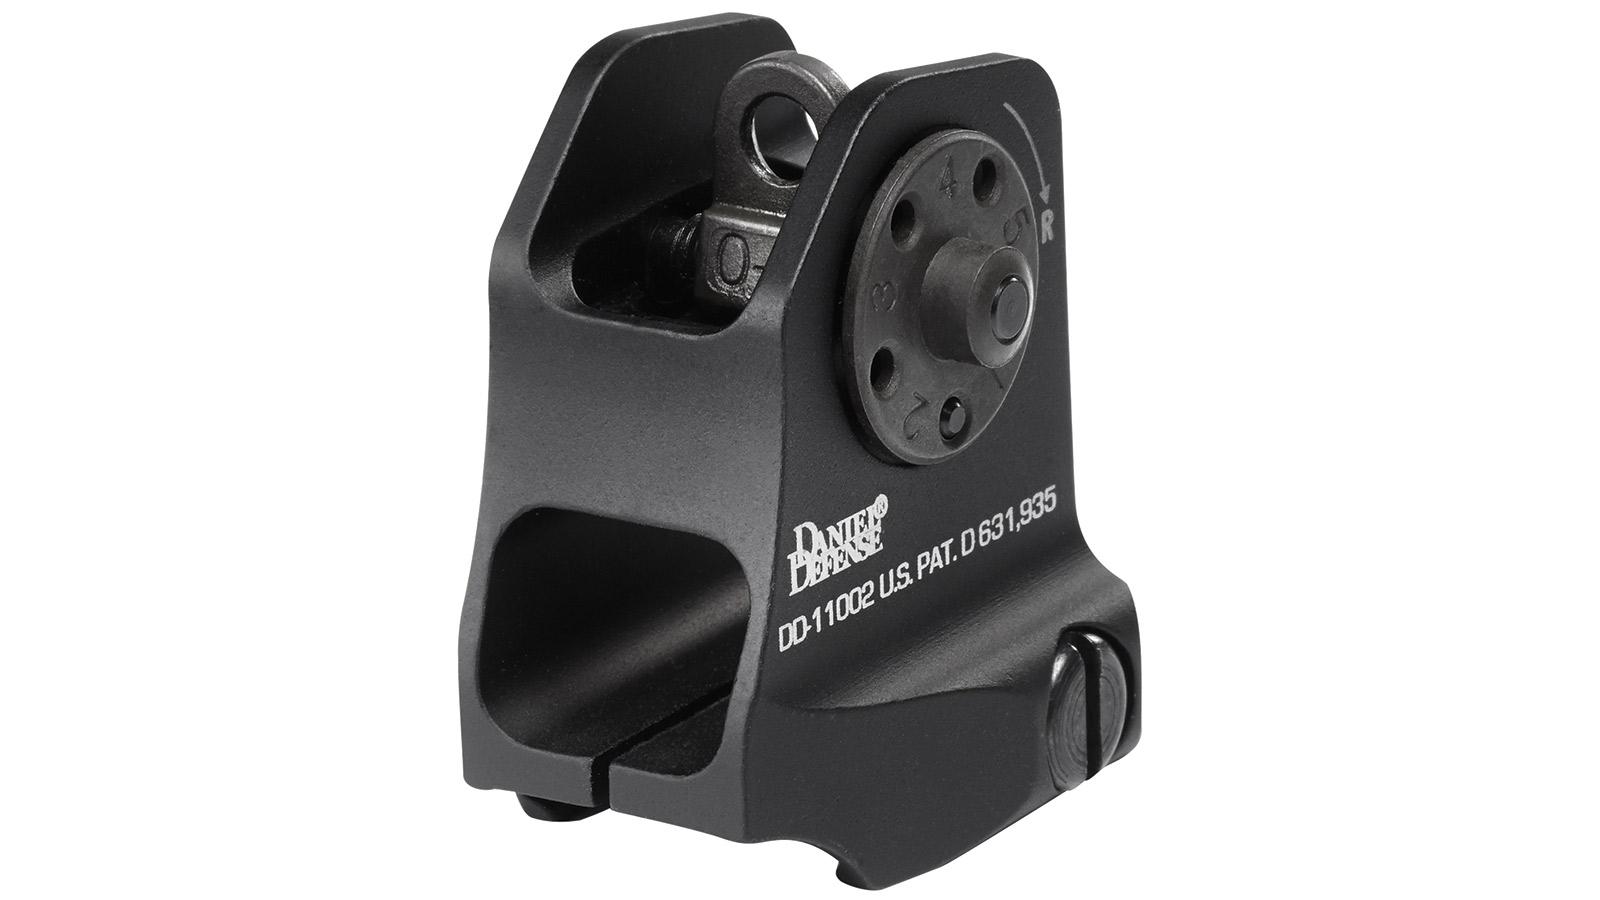 Daniel Defense A1.5 Fixed Rear Sight for AR Rifles